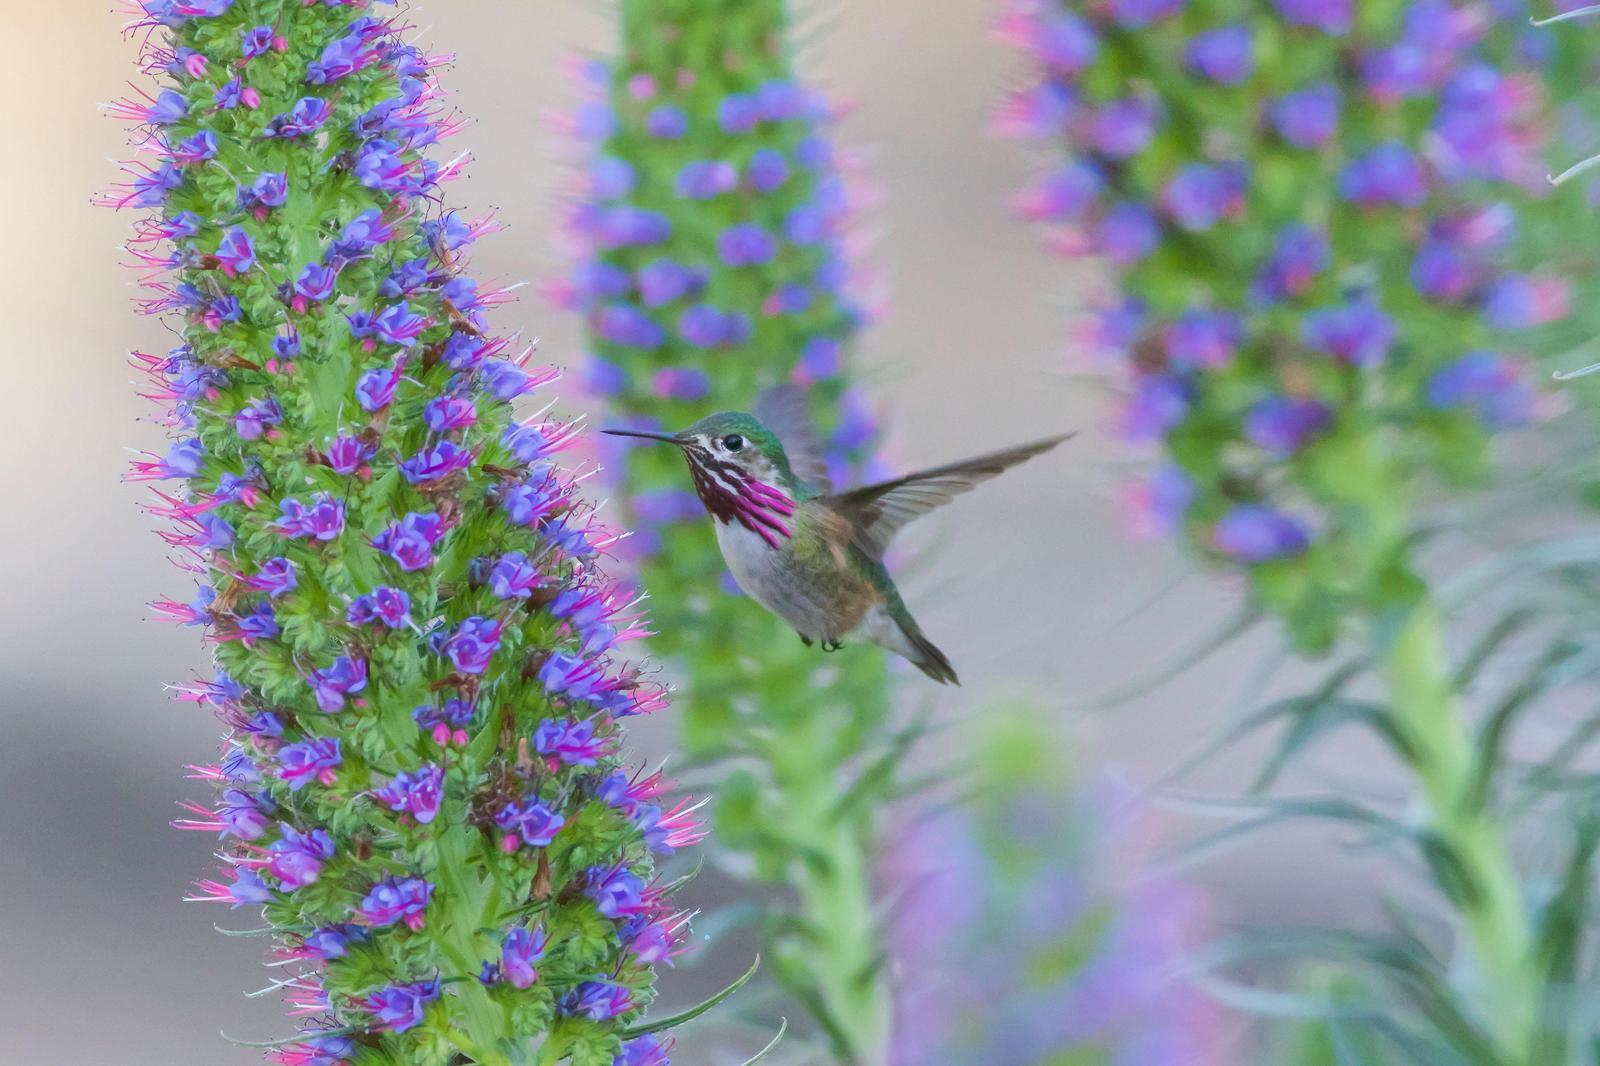 Calliope Hummingbird Photo by Tom Ford-Hutchinson